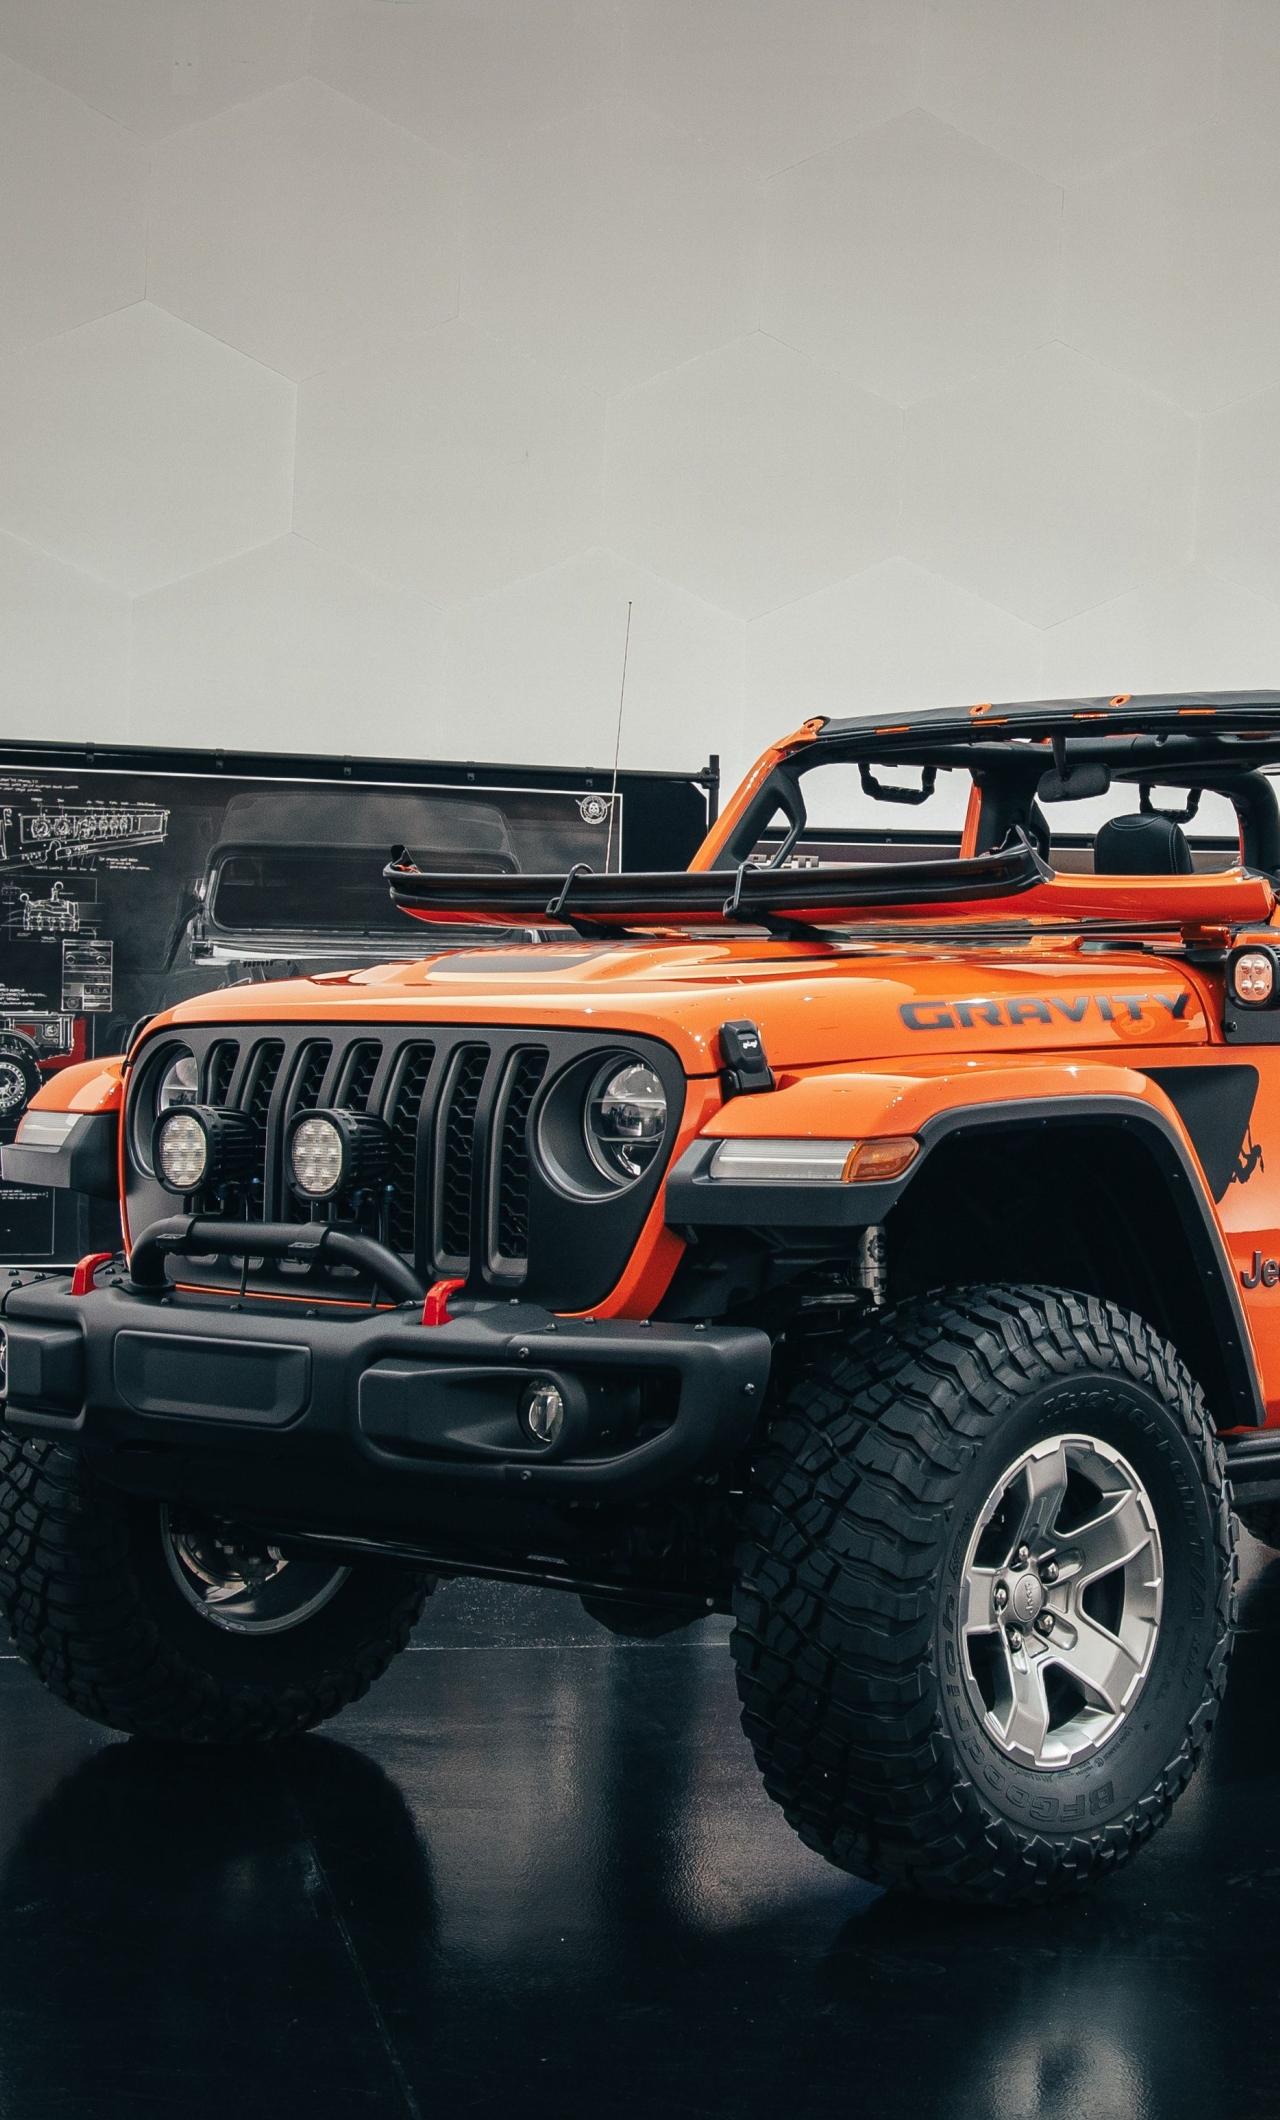 1280x2120 Jeep Gladiator Gravity iPhone 6 plus Wallpaper ...